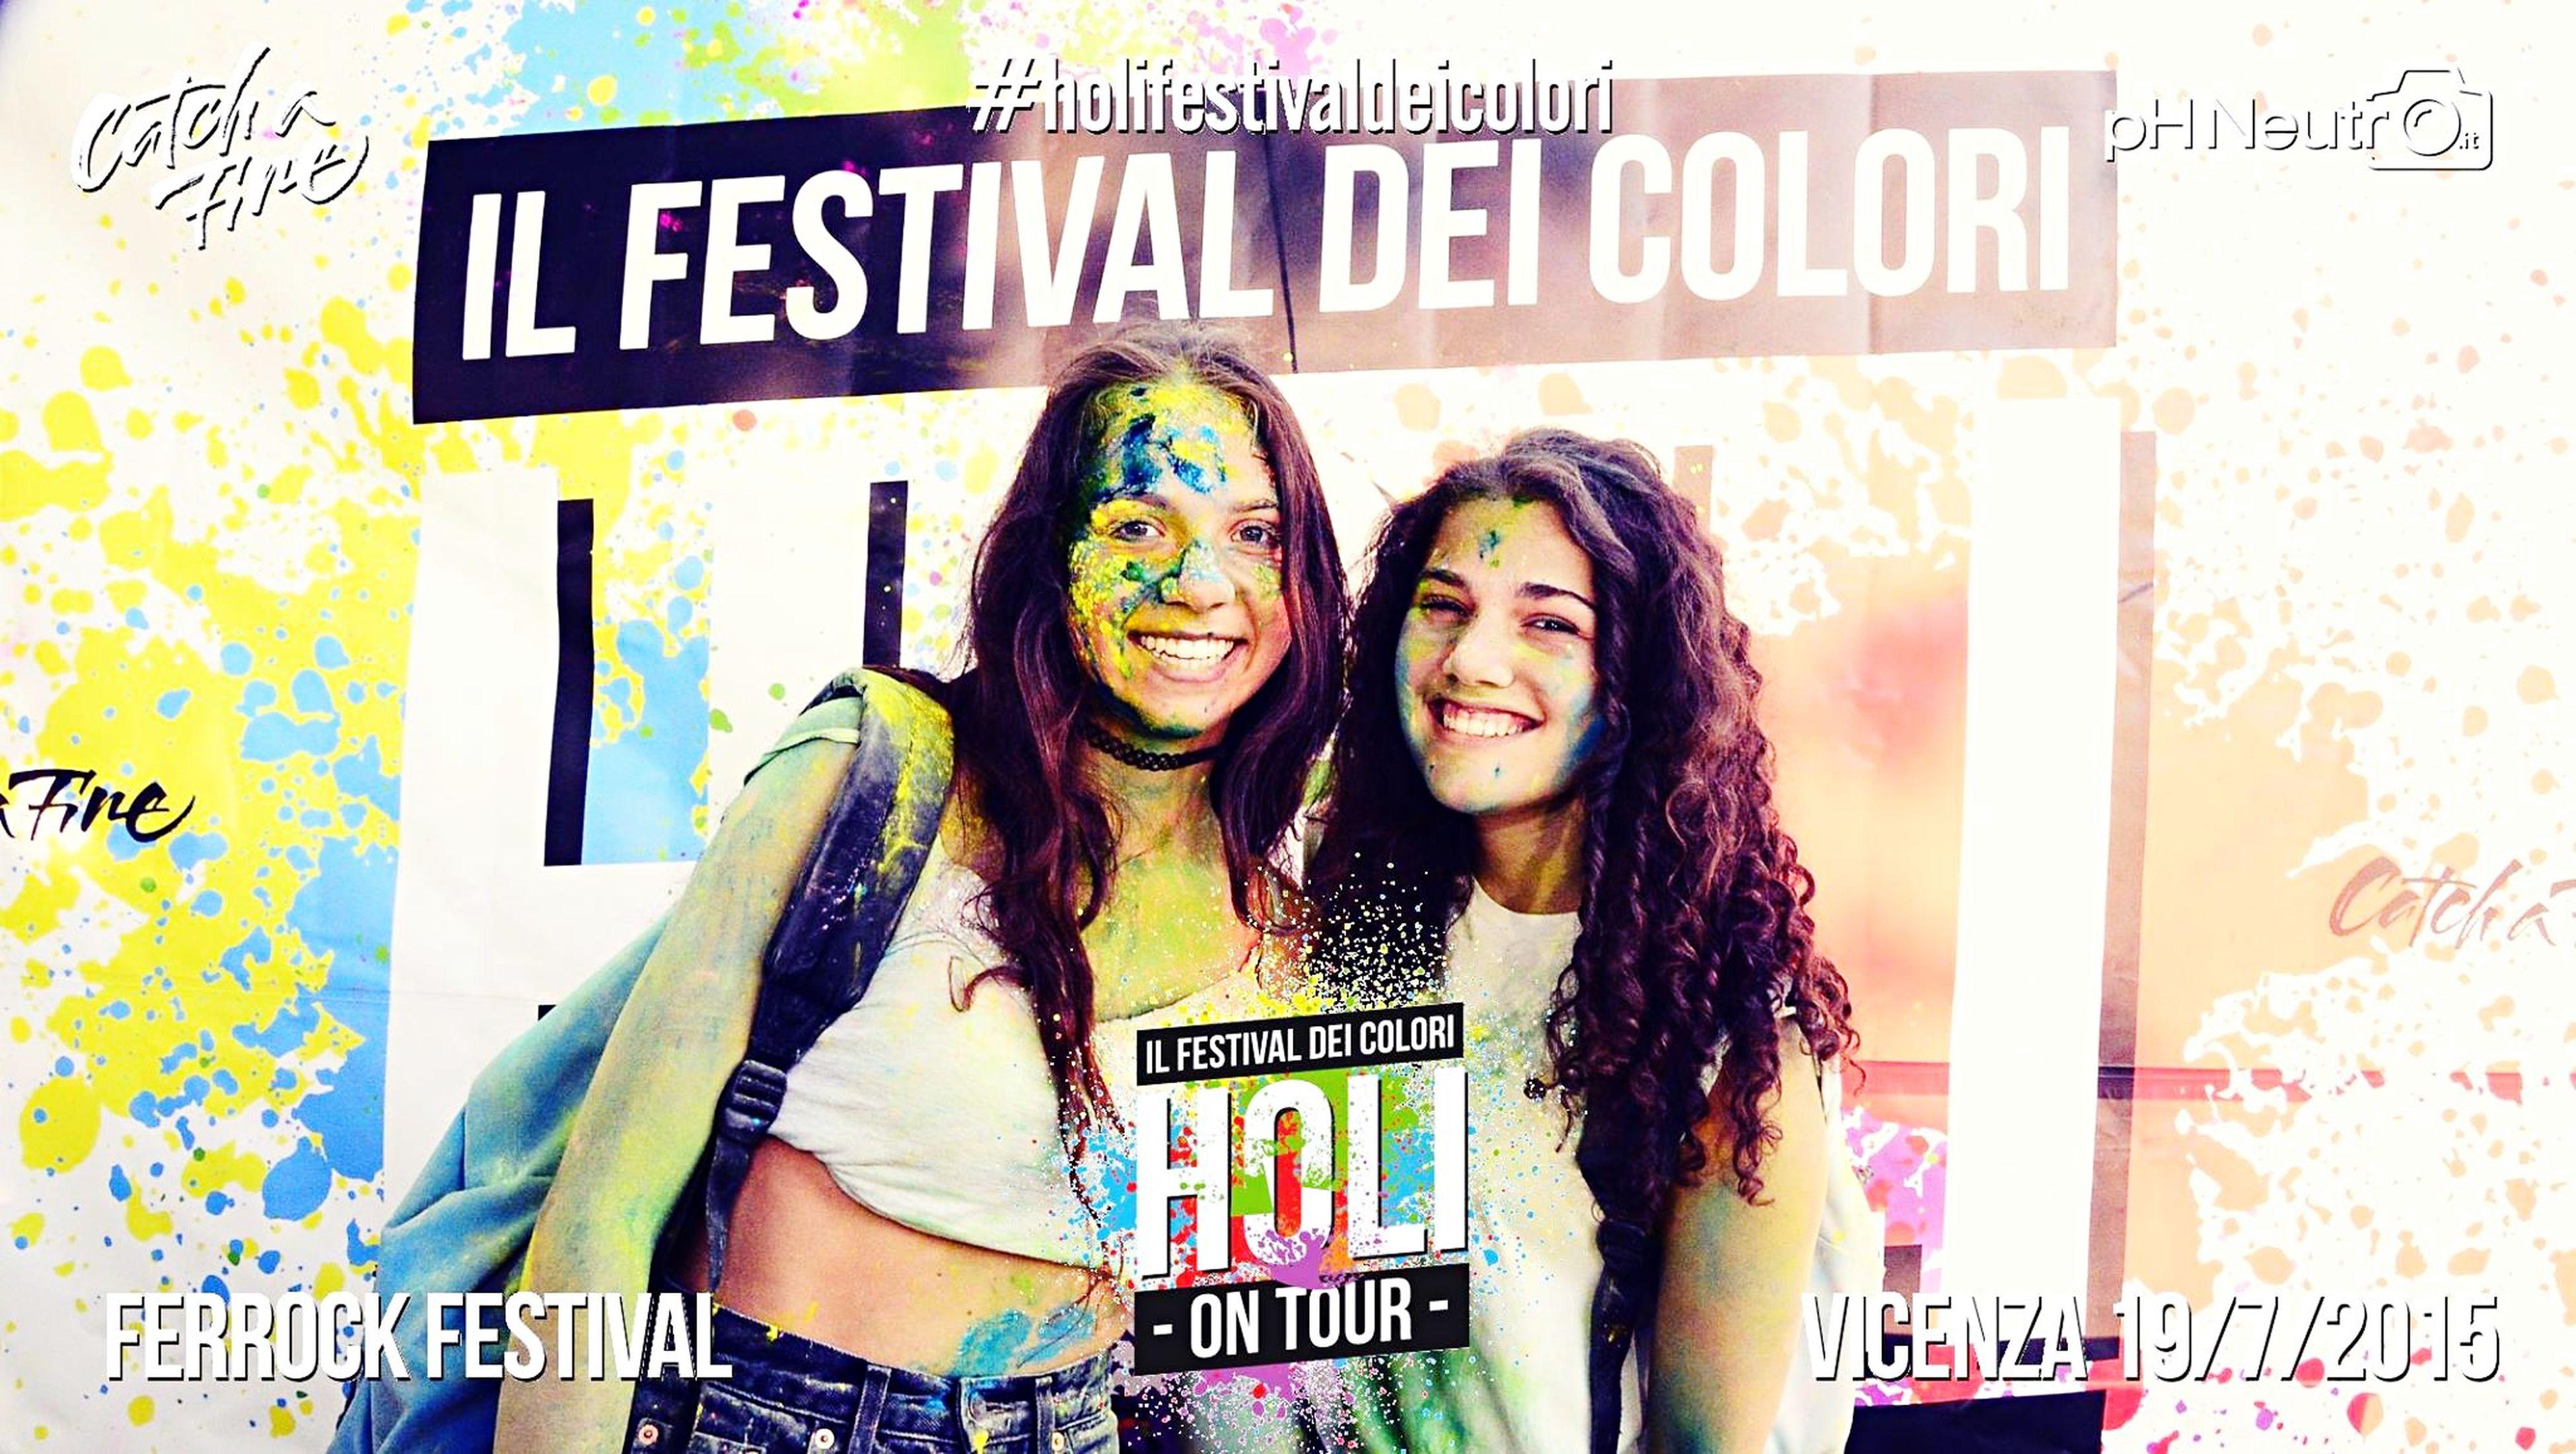 Holi festival dei colori Holi Holi Festival Ferrock Smile Happiness Best Friends Colours